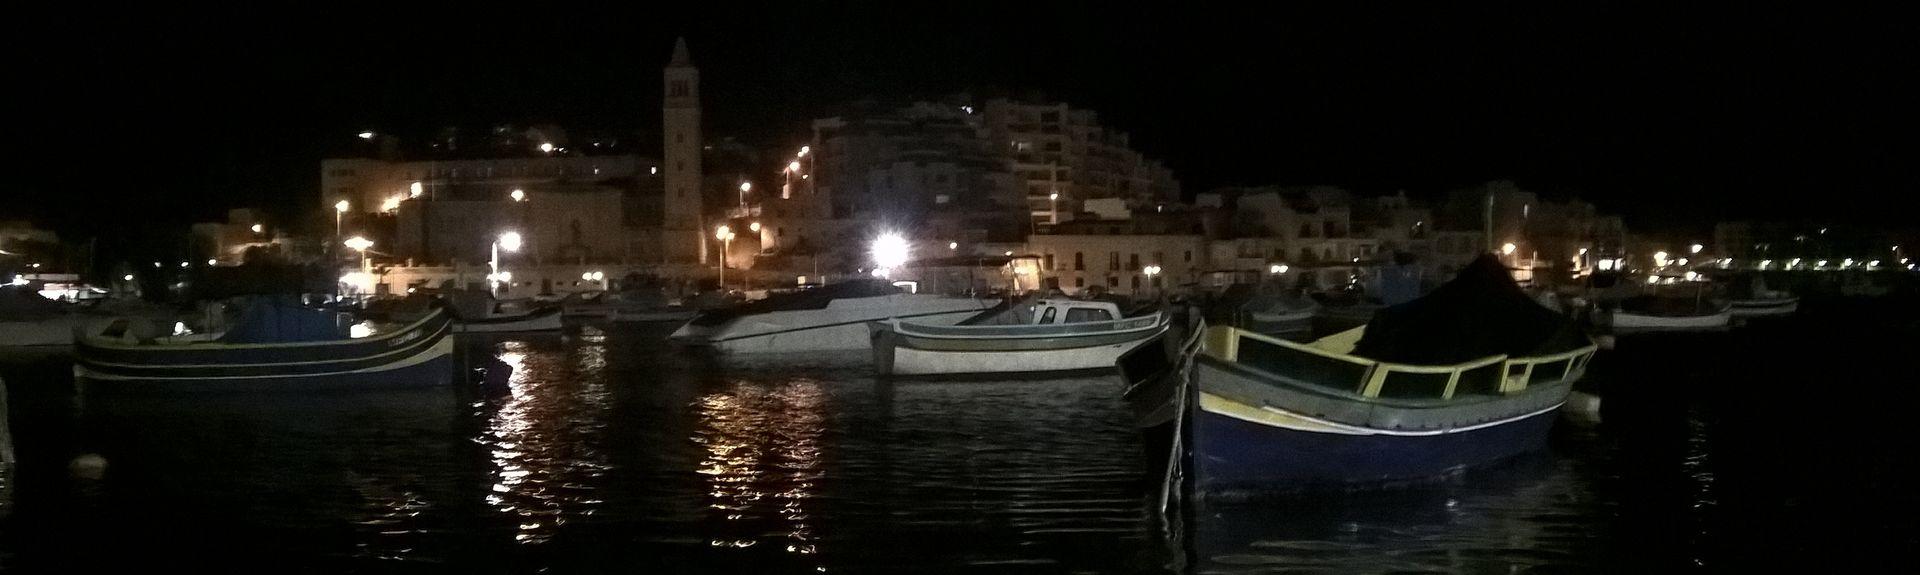 Iż-Żejtun, Malte